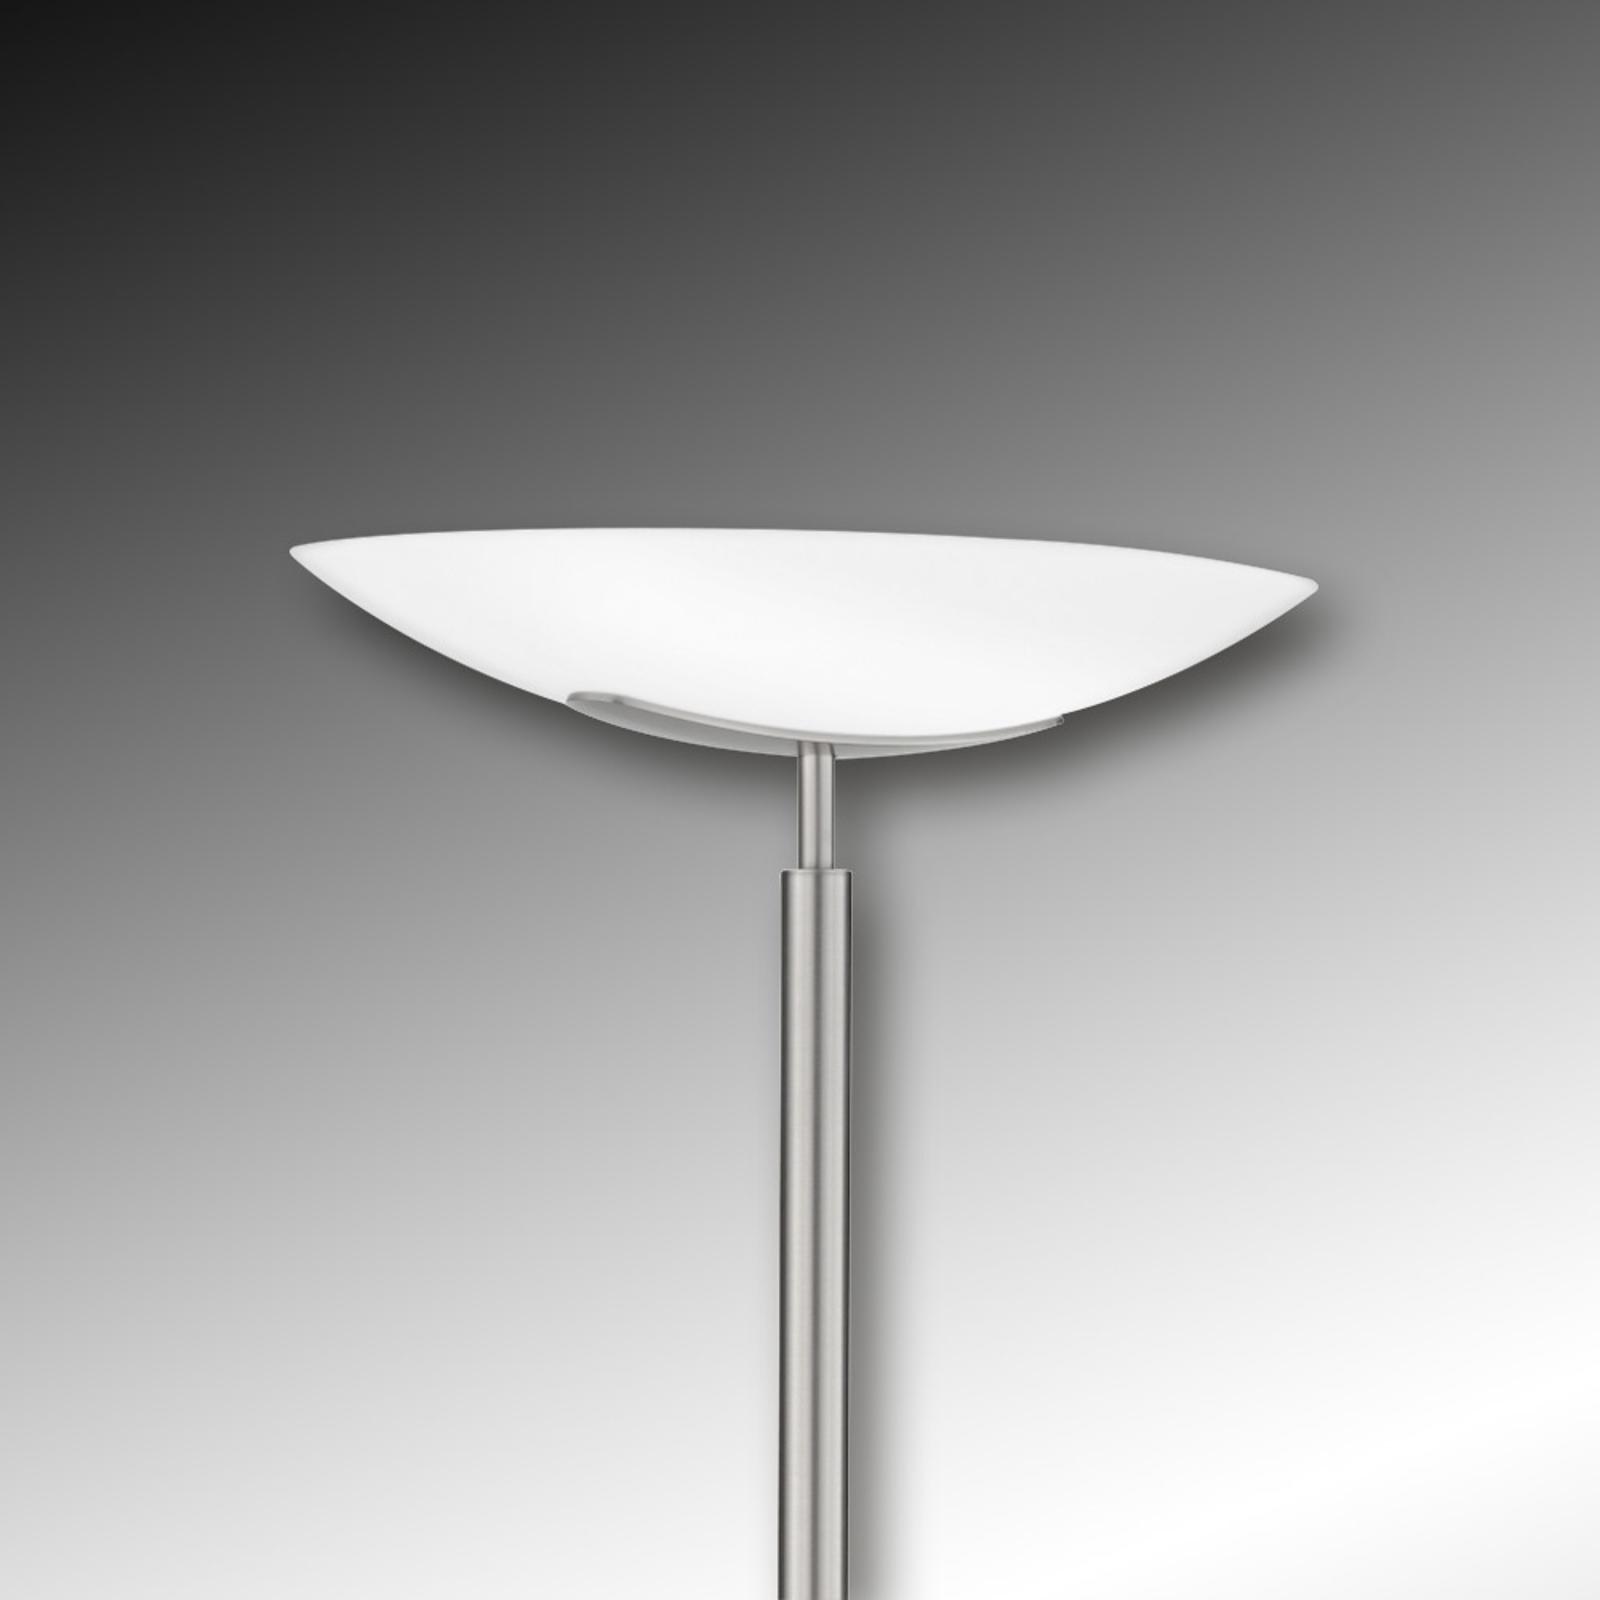 Lampe éclairage indirect Novale nickel mat